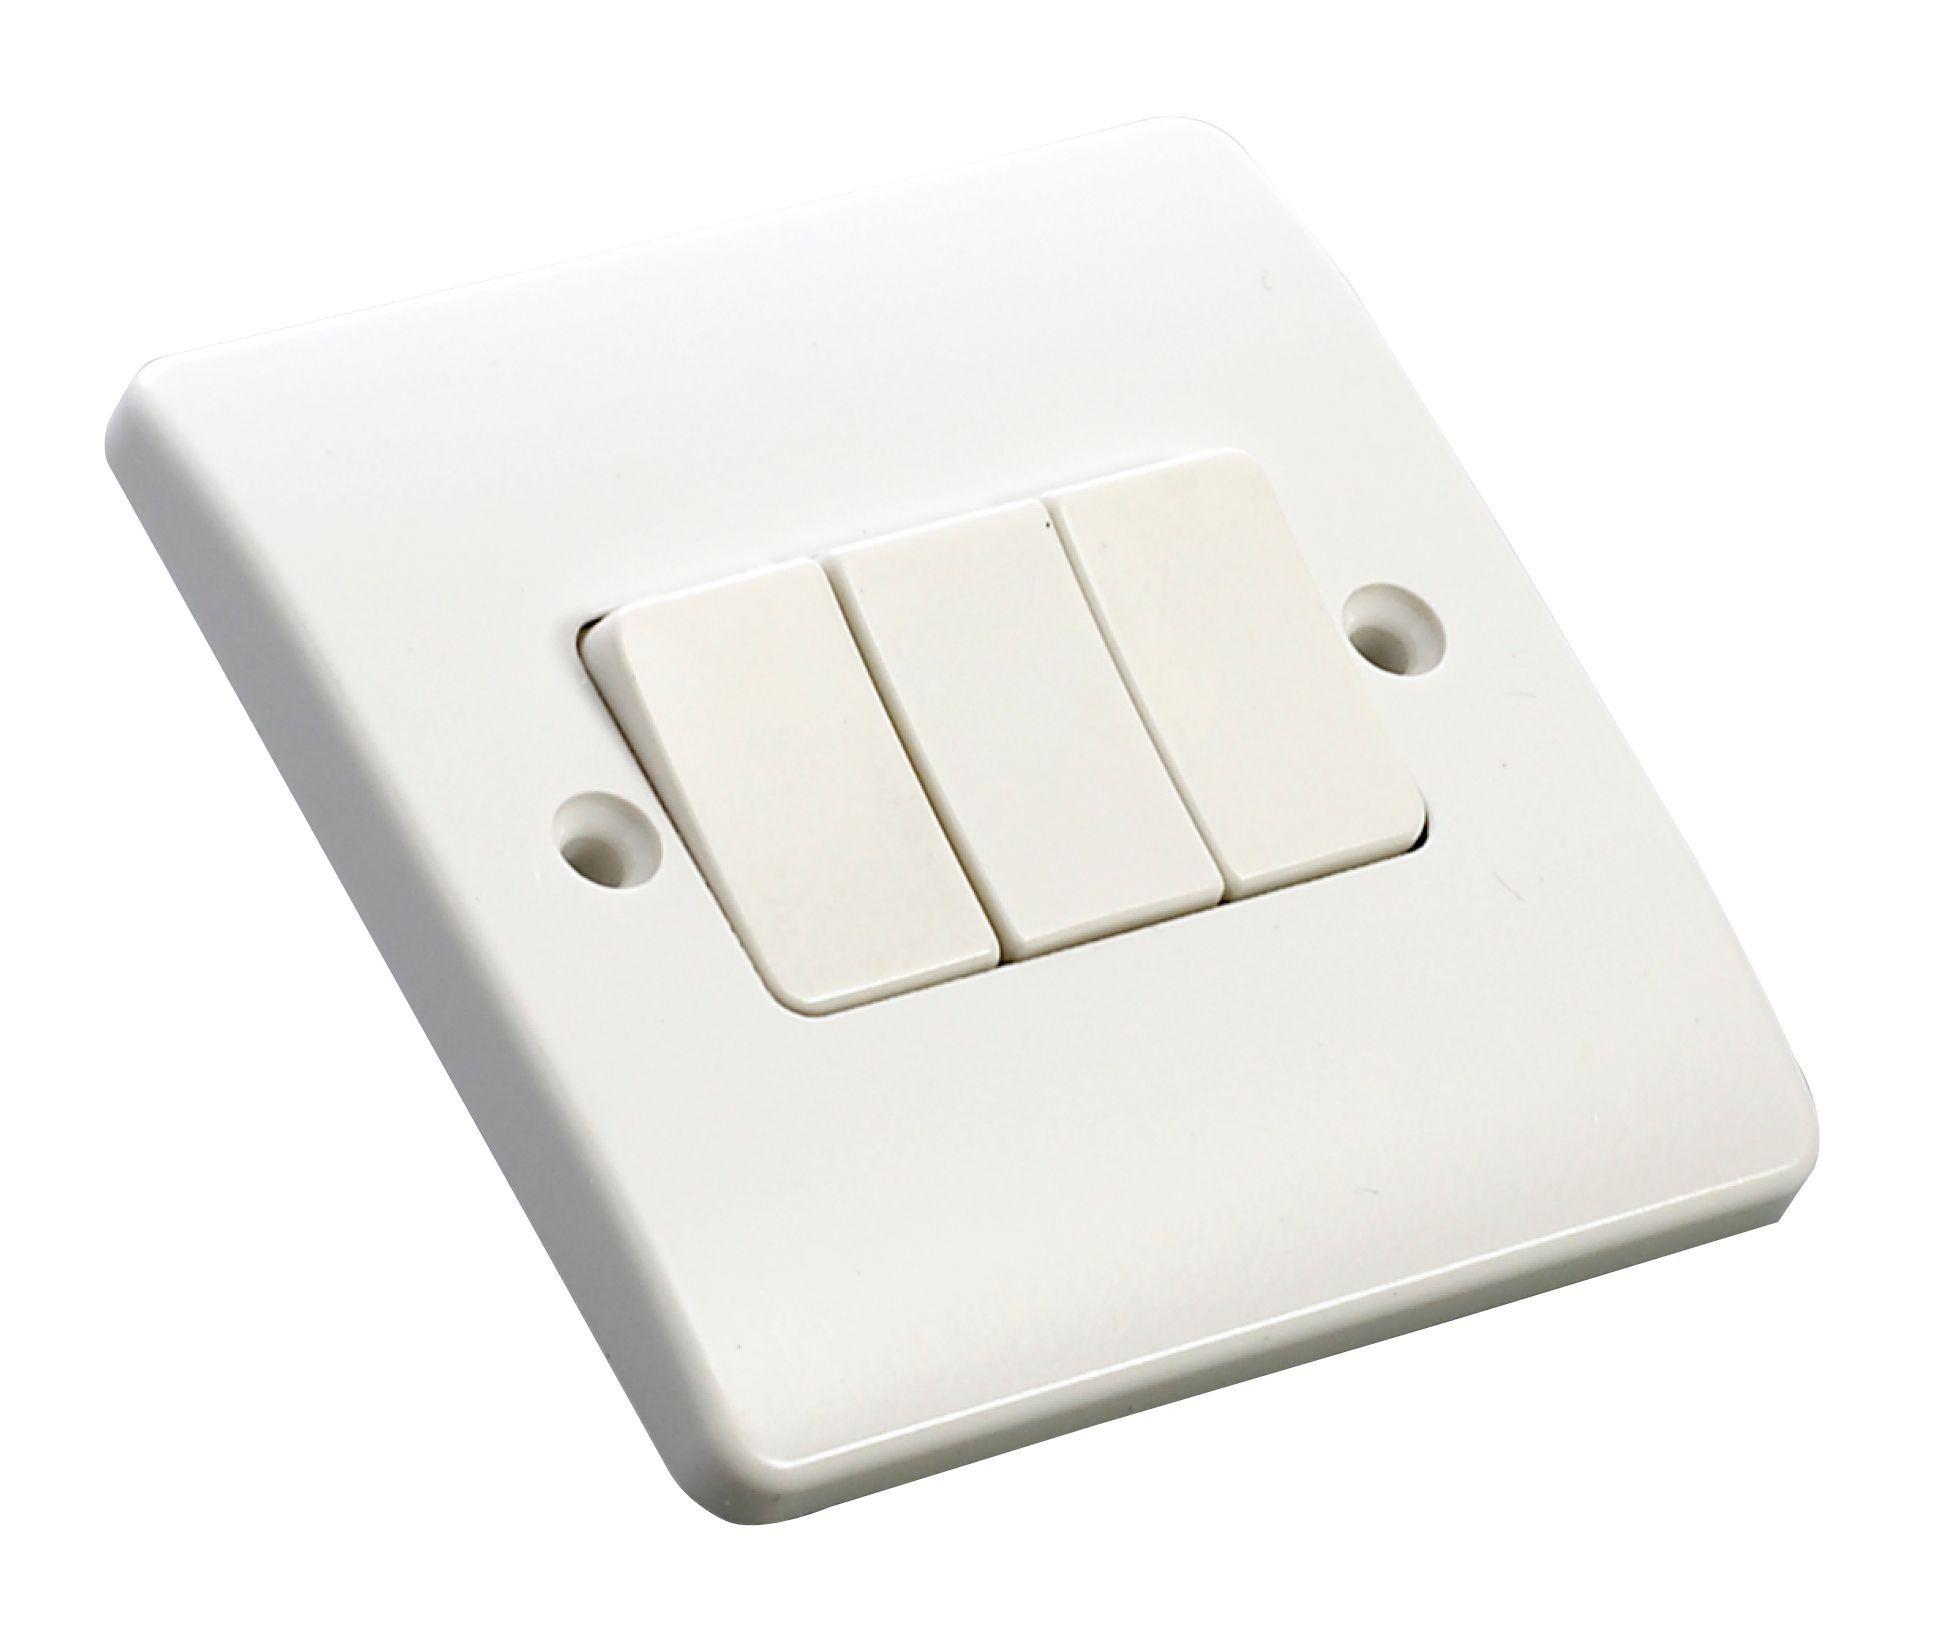 MK 10A 2-Way Triple White Gloss Light Switch | Departments | DIY ...